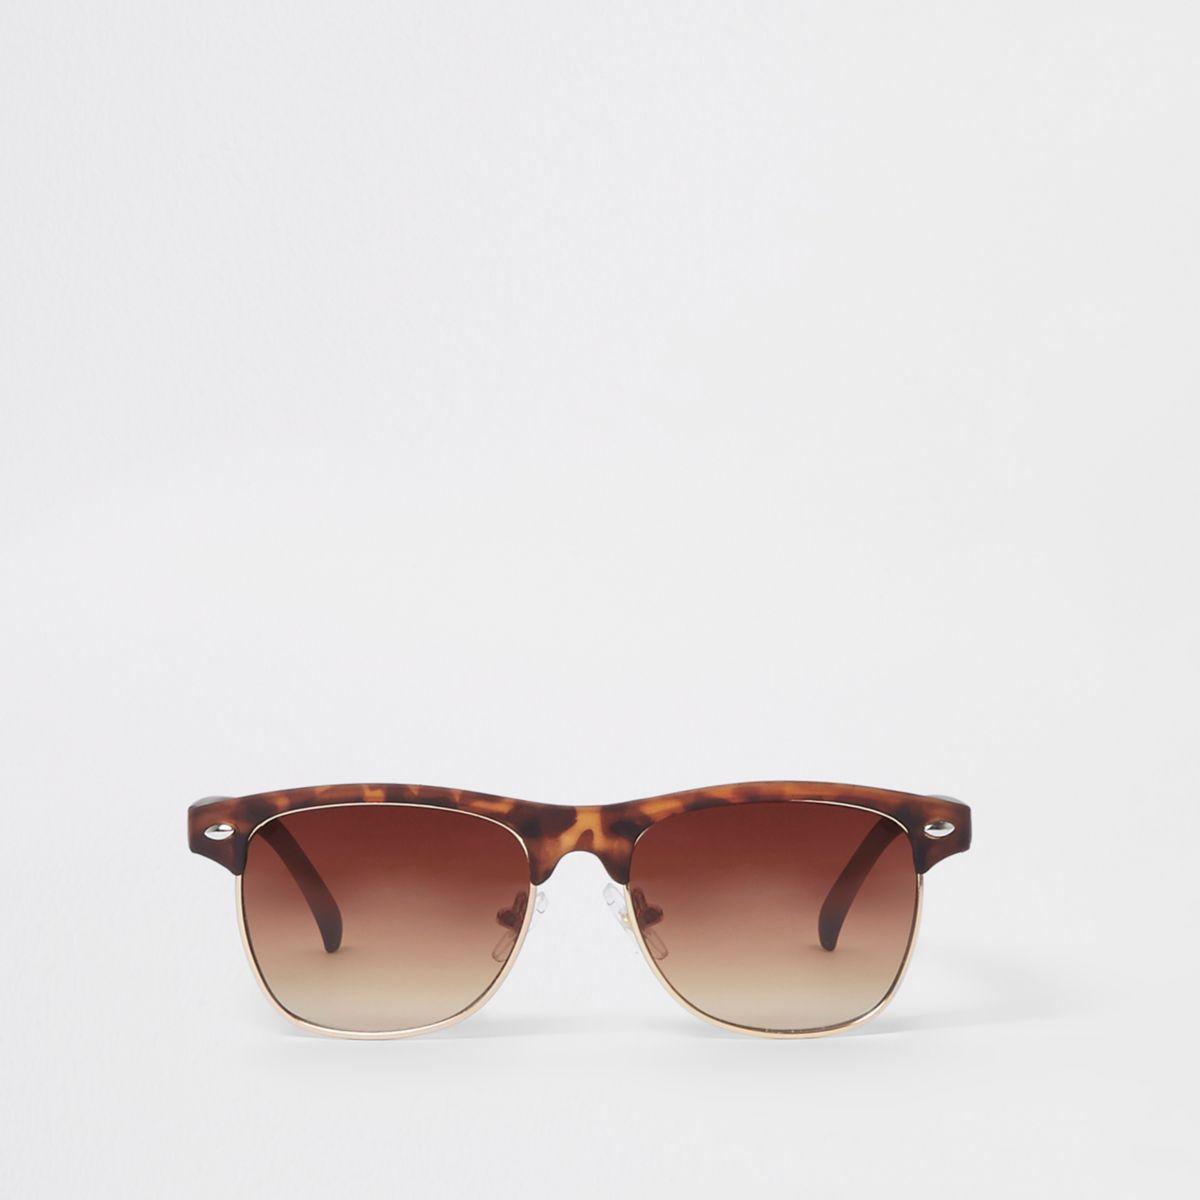 Boys brown tortoiseshell flat top sunglasses